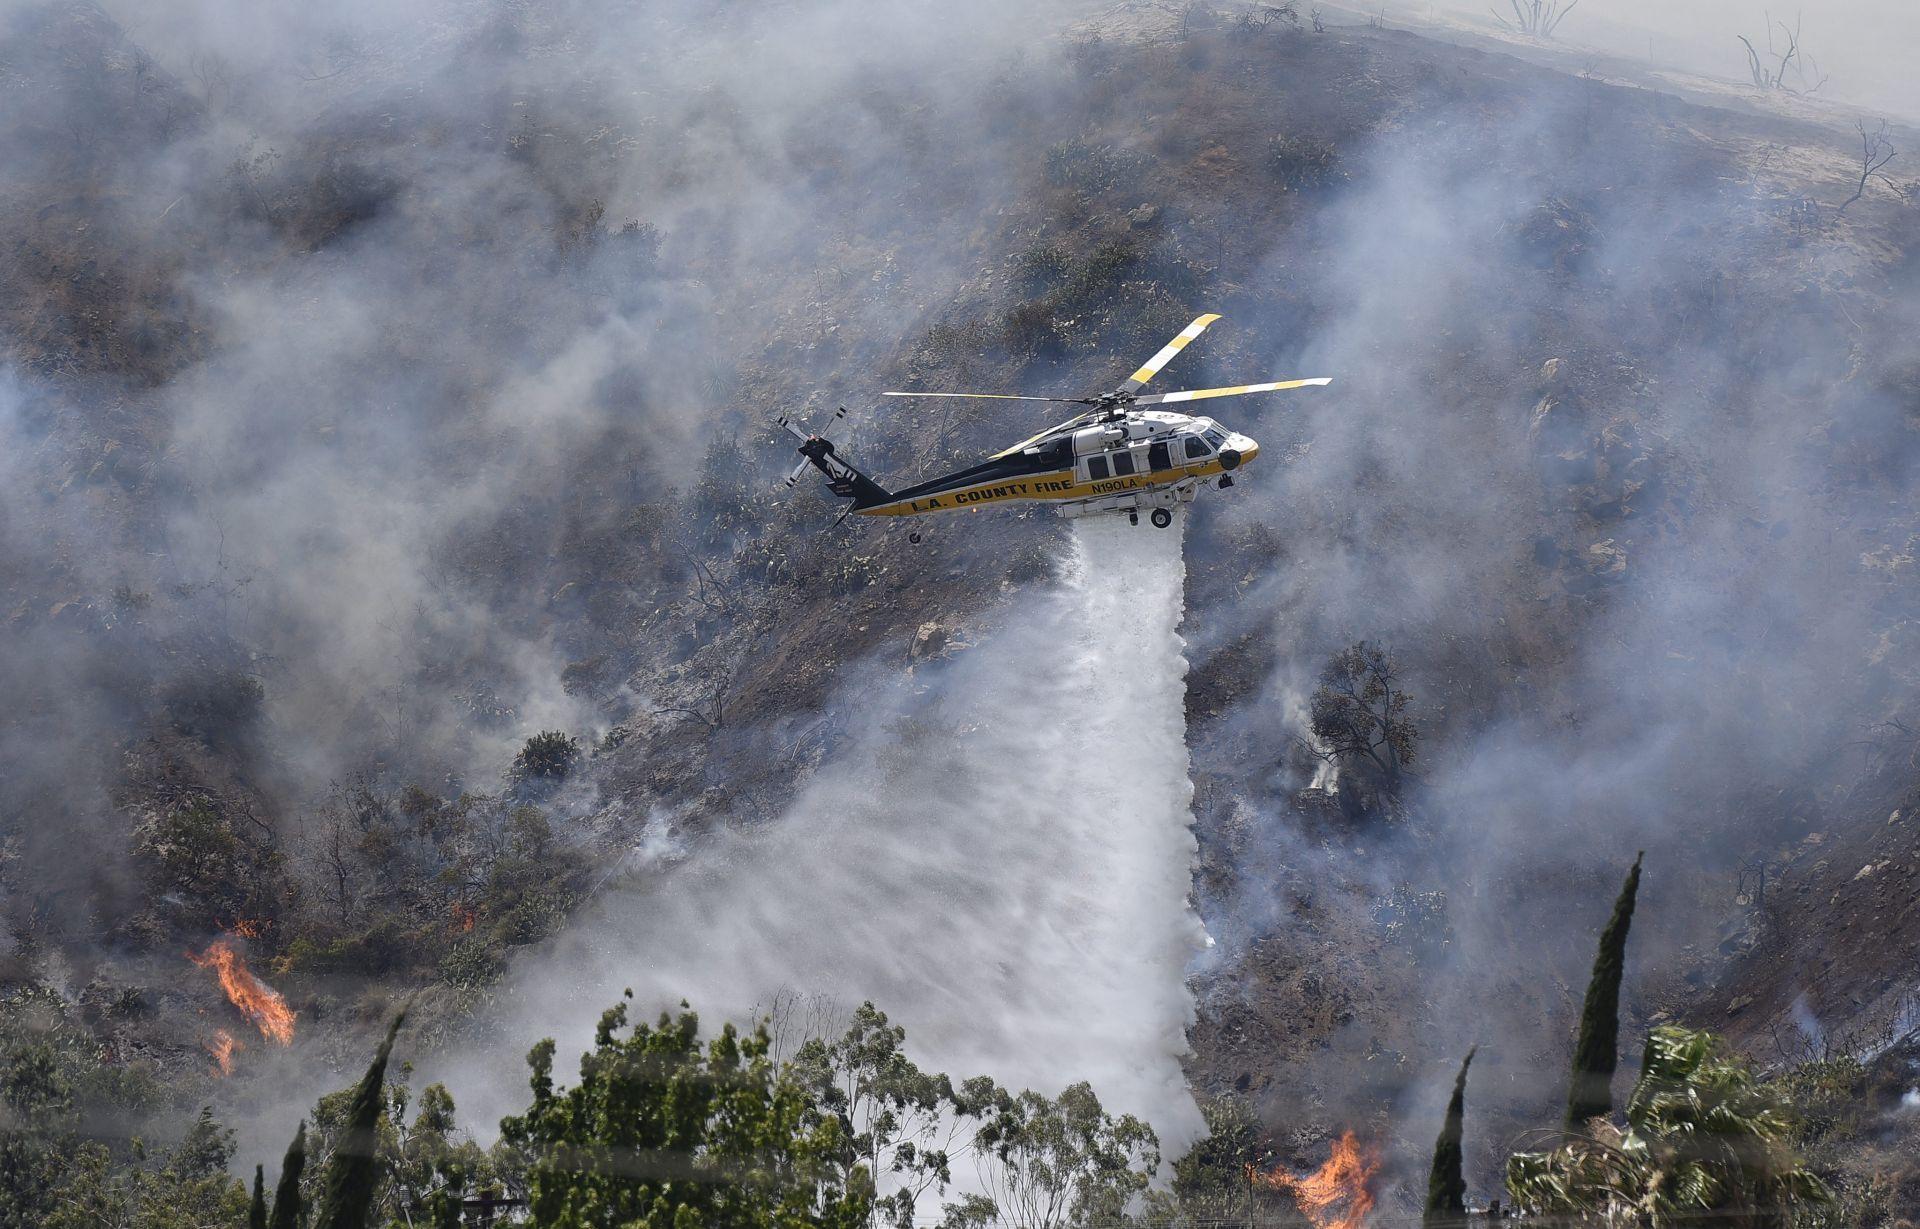 EVAKUACIJA STANOVNIKA: Stotine ljudi bježe pred požarima u Kaliforniji